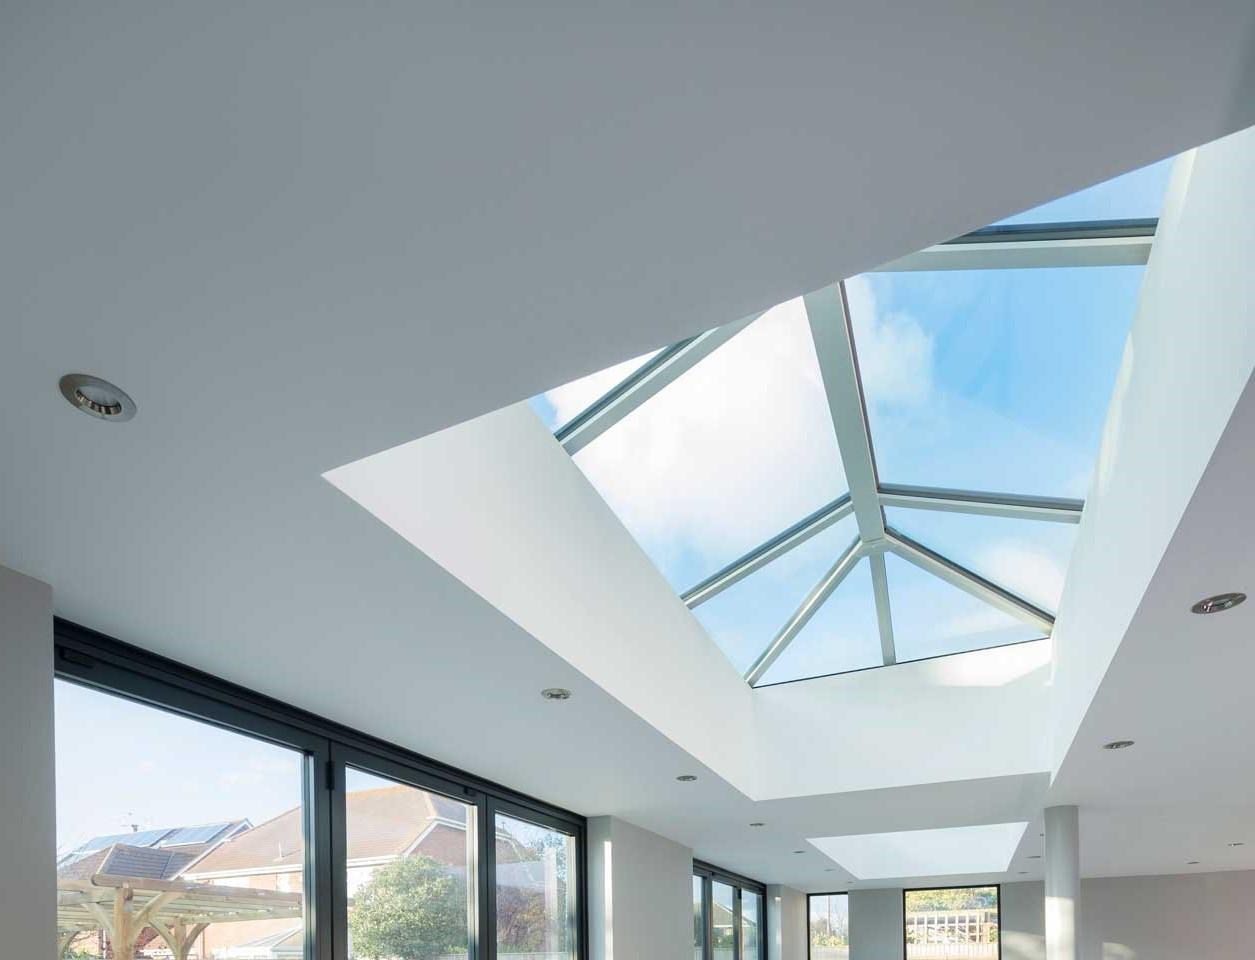 aluminium roof lanterns cost stoke-on-trent